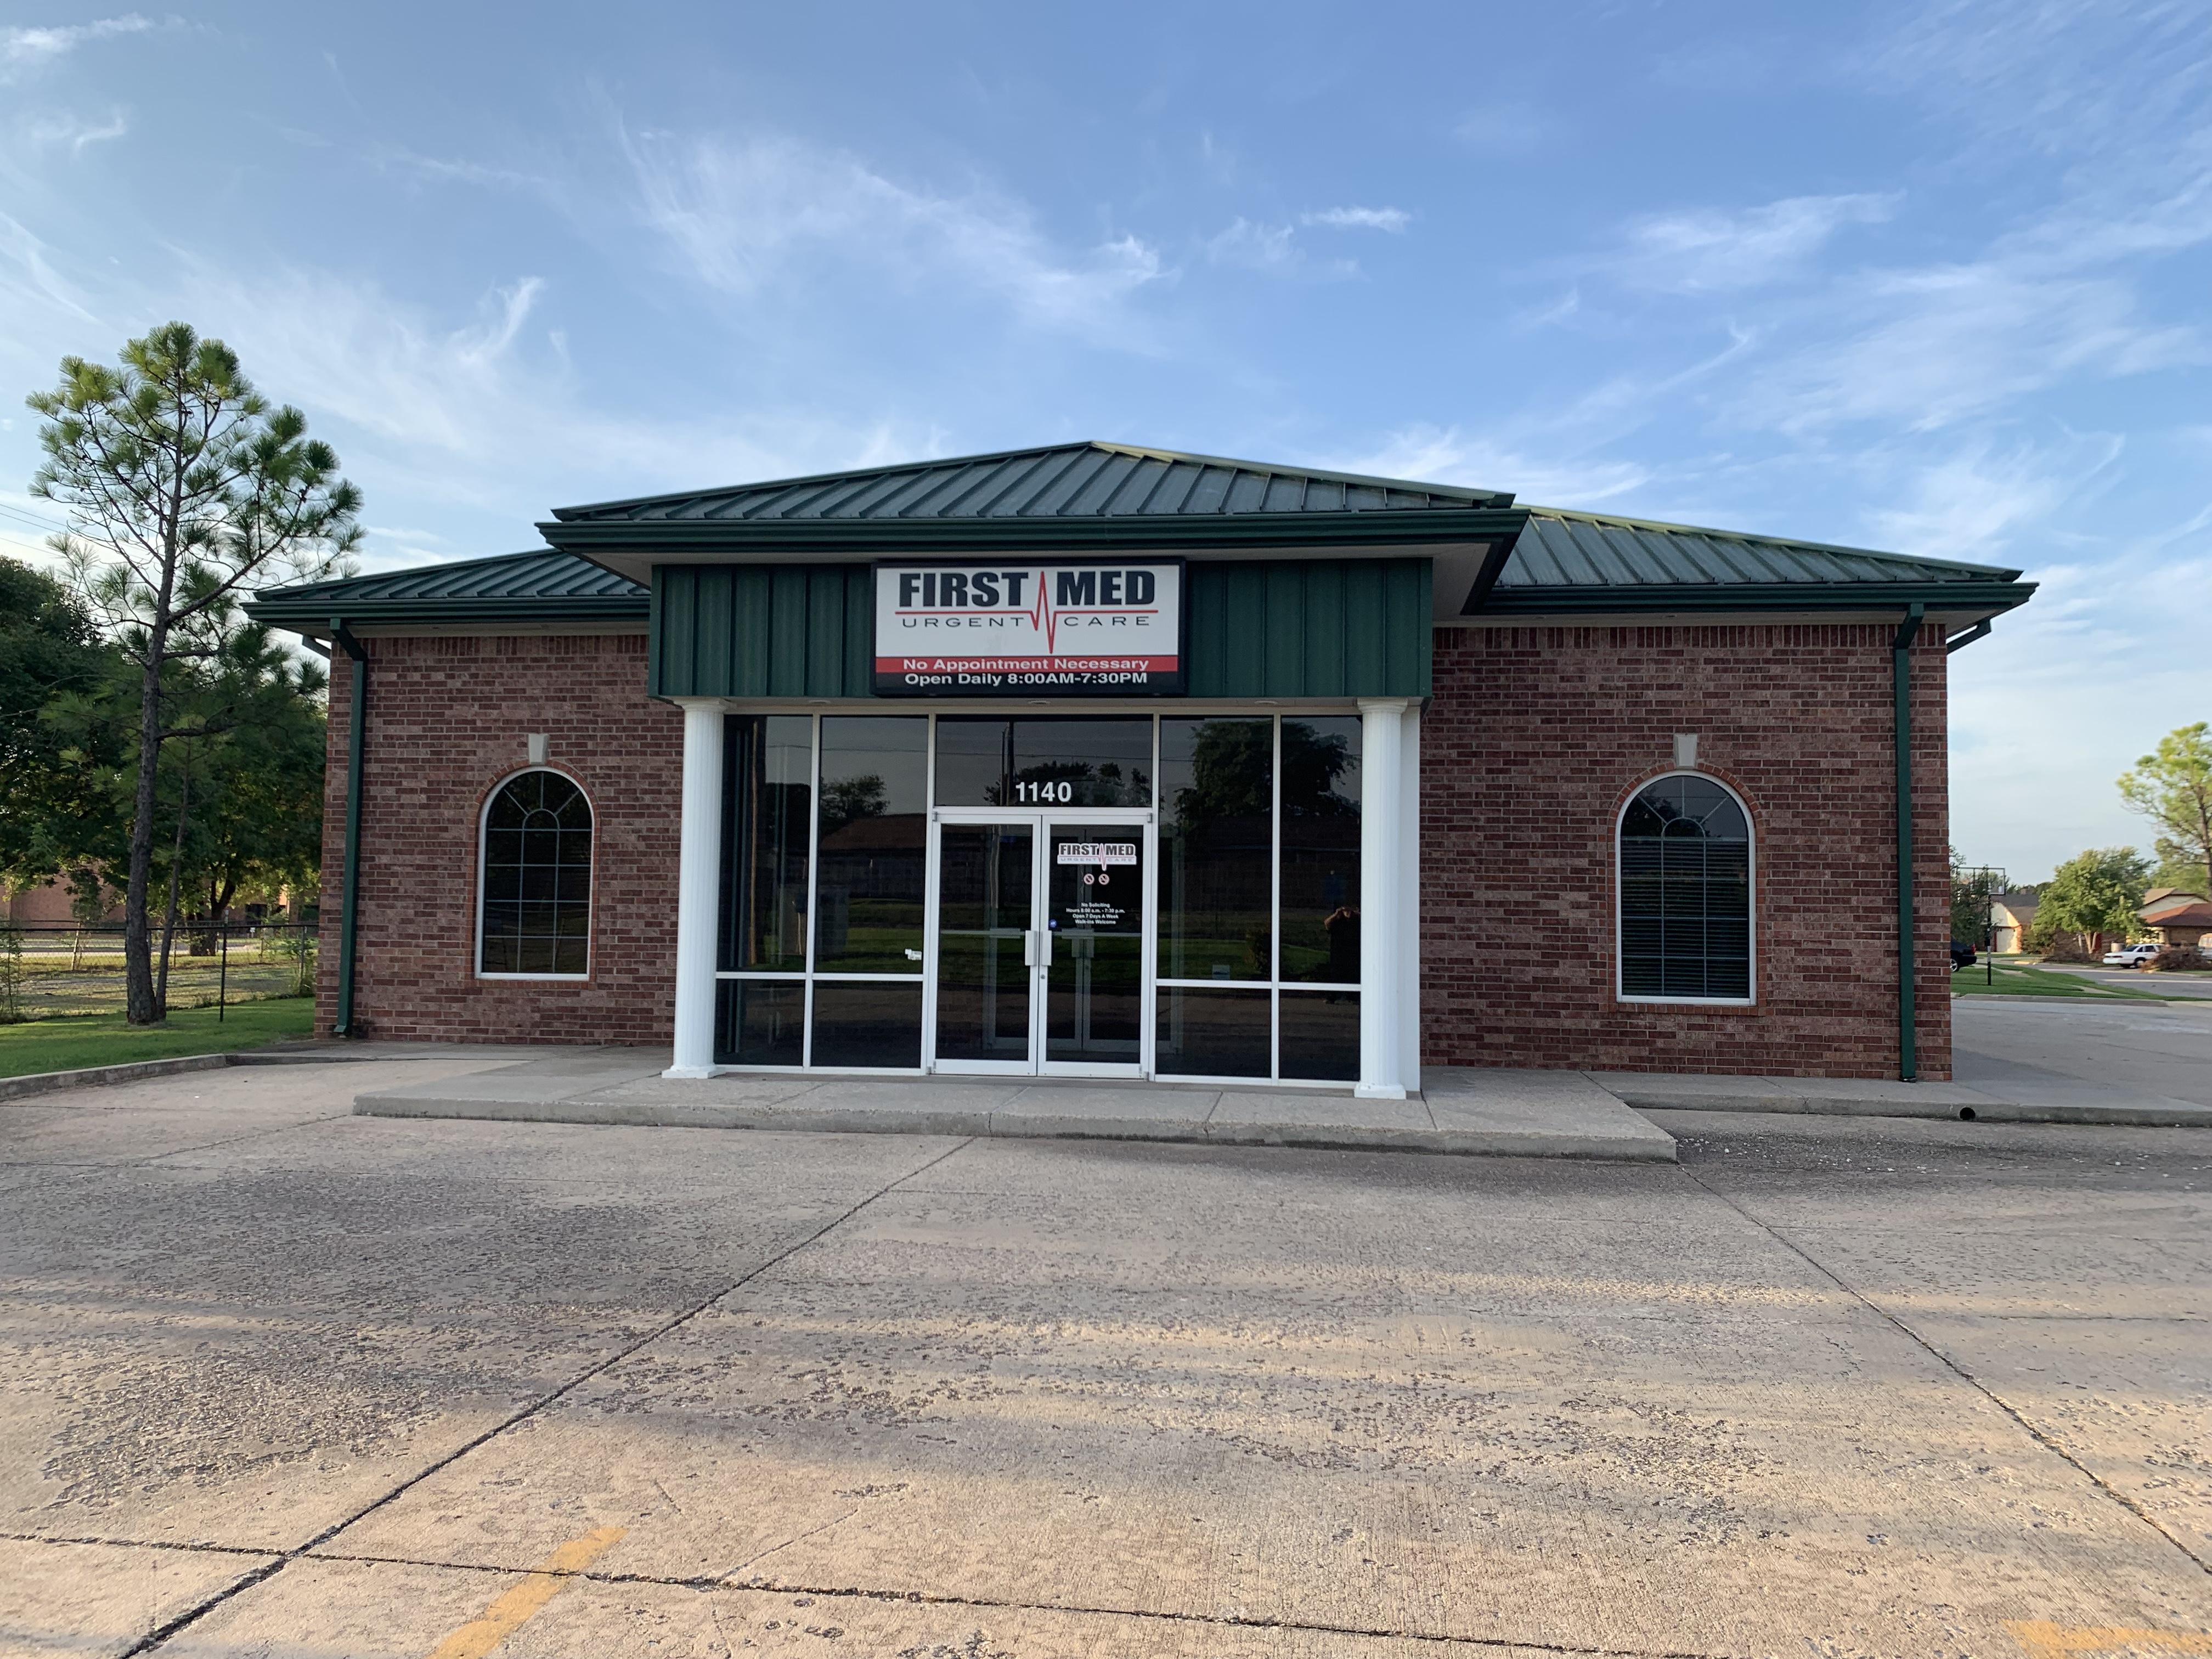 First Med Urgent Care - Southwest Oklahoma City (S Western and SW 104th) - Urgent Care Solv in Oklahoma City, OK